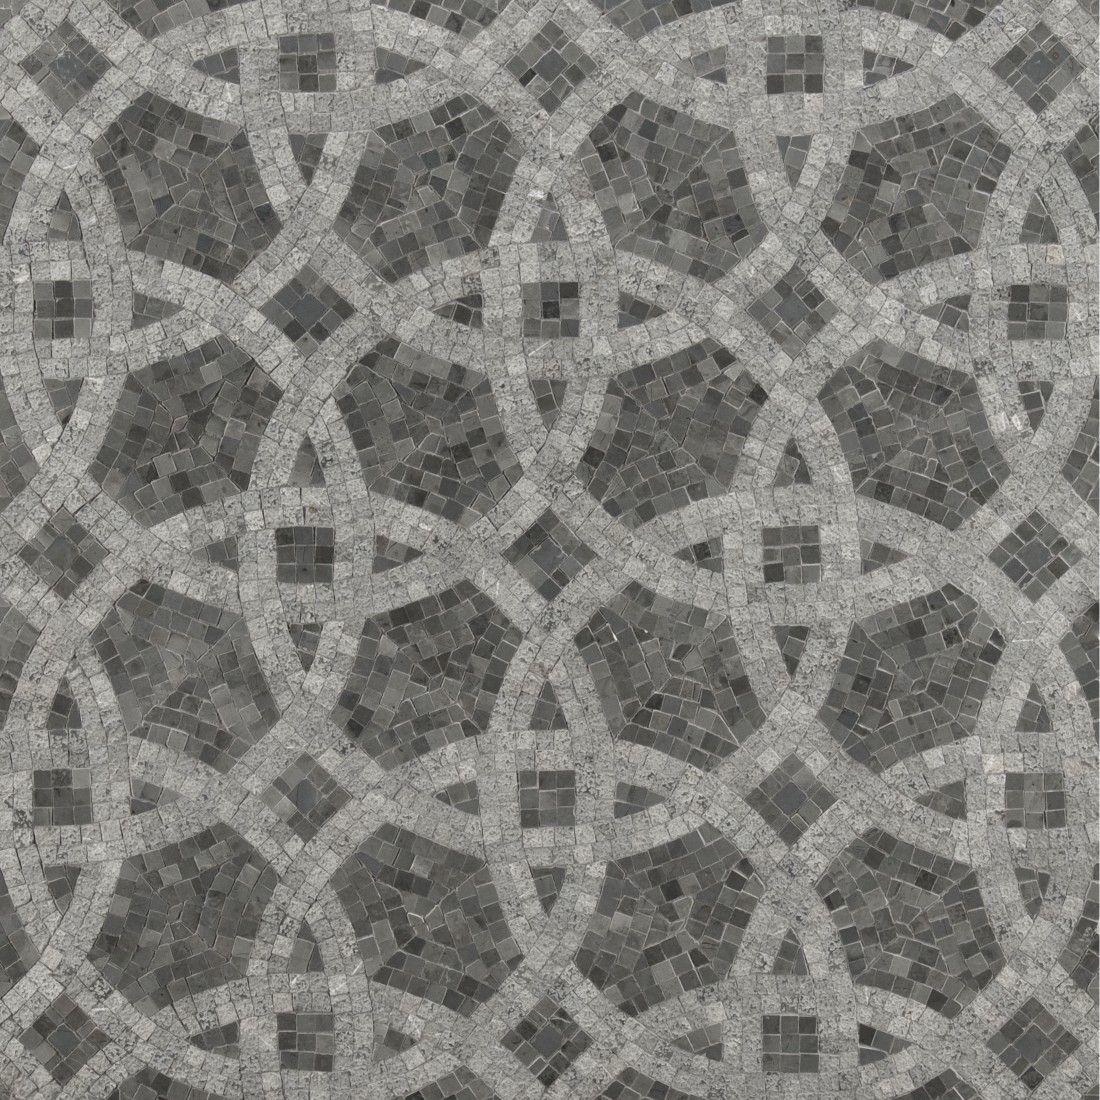 Piccolino Mosaics | ANN SACKS Tile & Stone | tesselation mosaic with ...